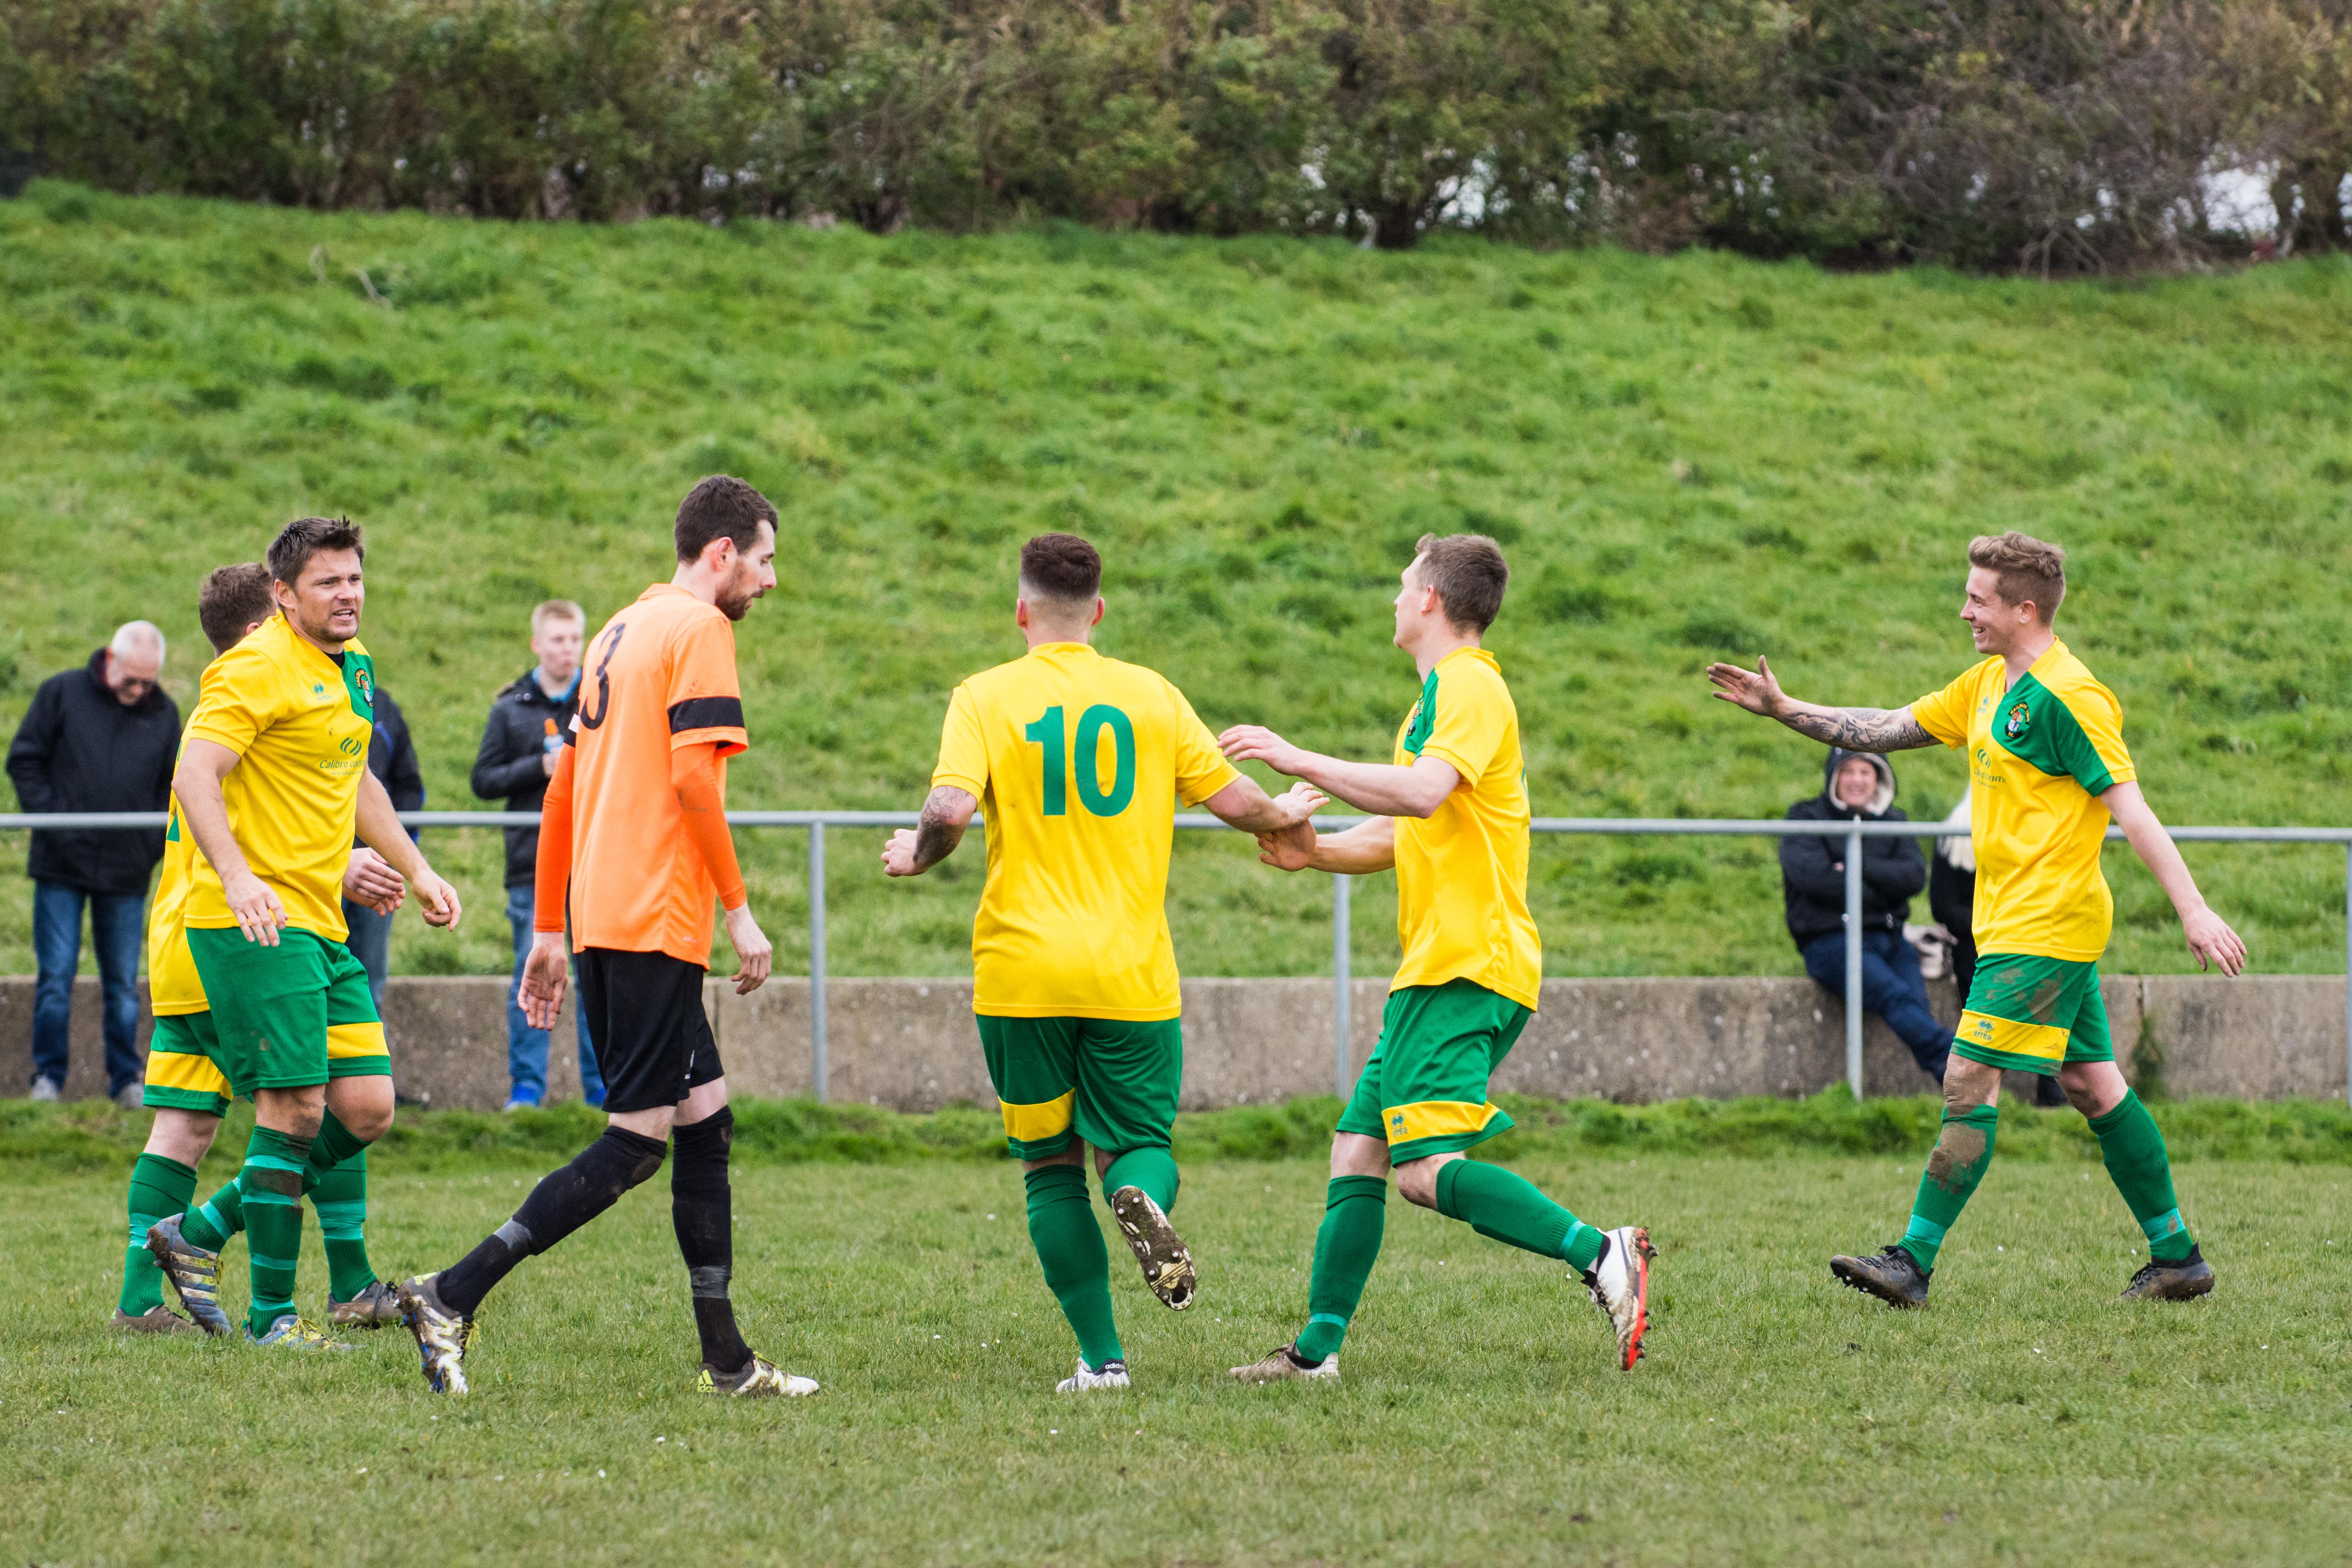 DAVID_JEFFERY Mile Oak FC vs Hailsham Town FC 24.03.18 61